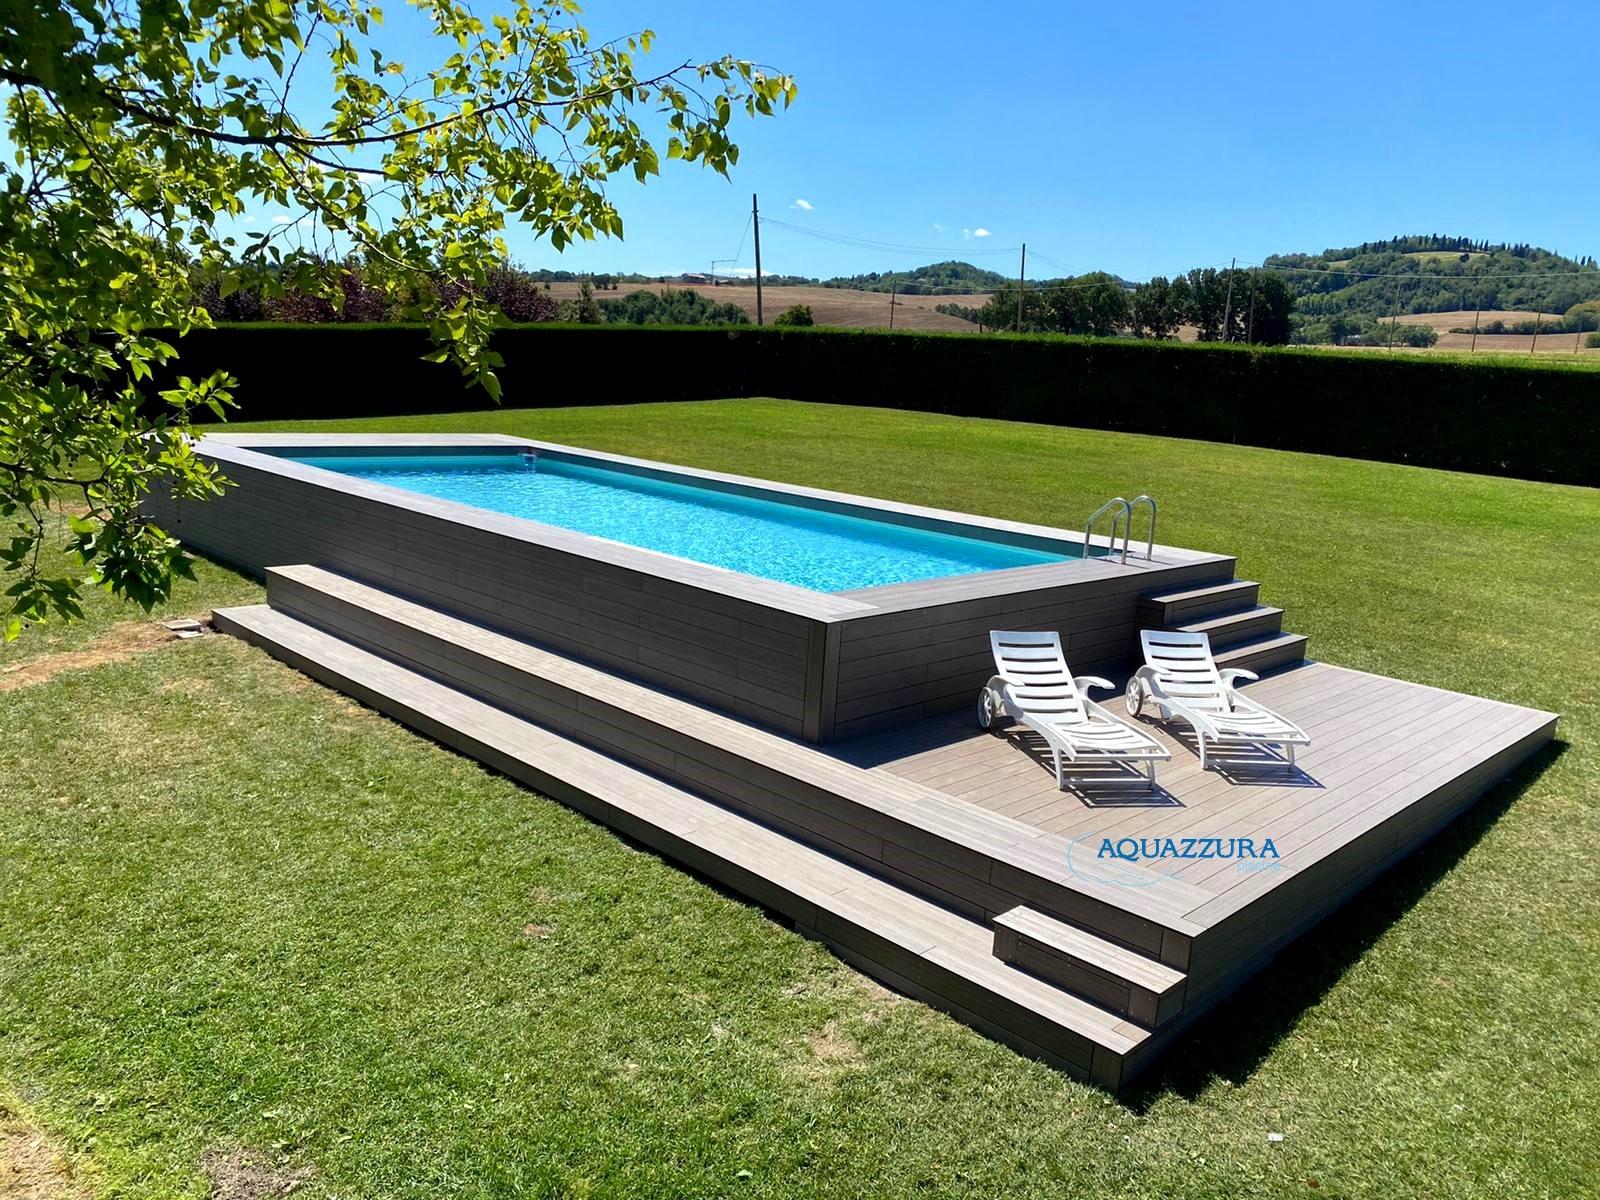 Le 48 pi belle piscine fuori terra rivestite piscine for Piscina rialzata